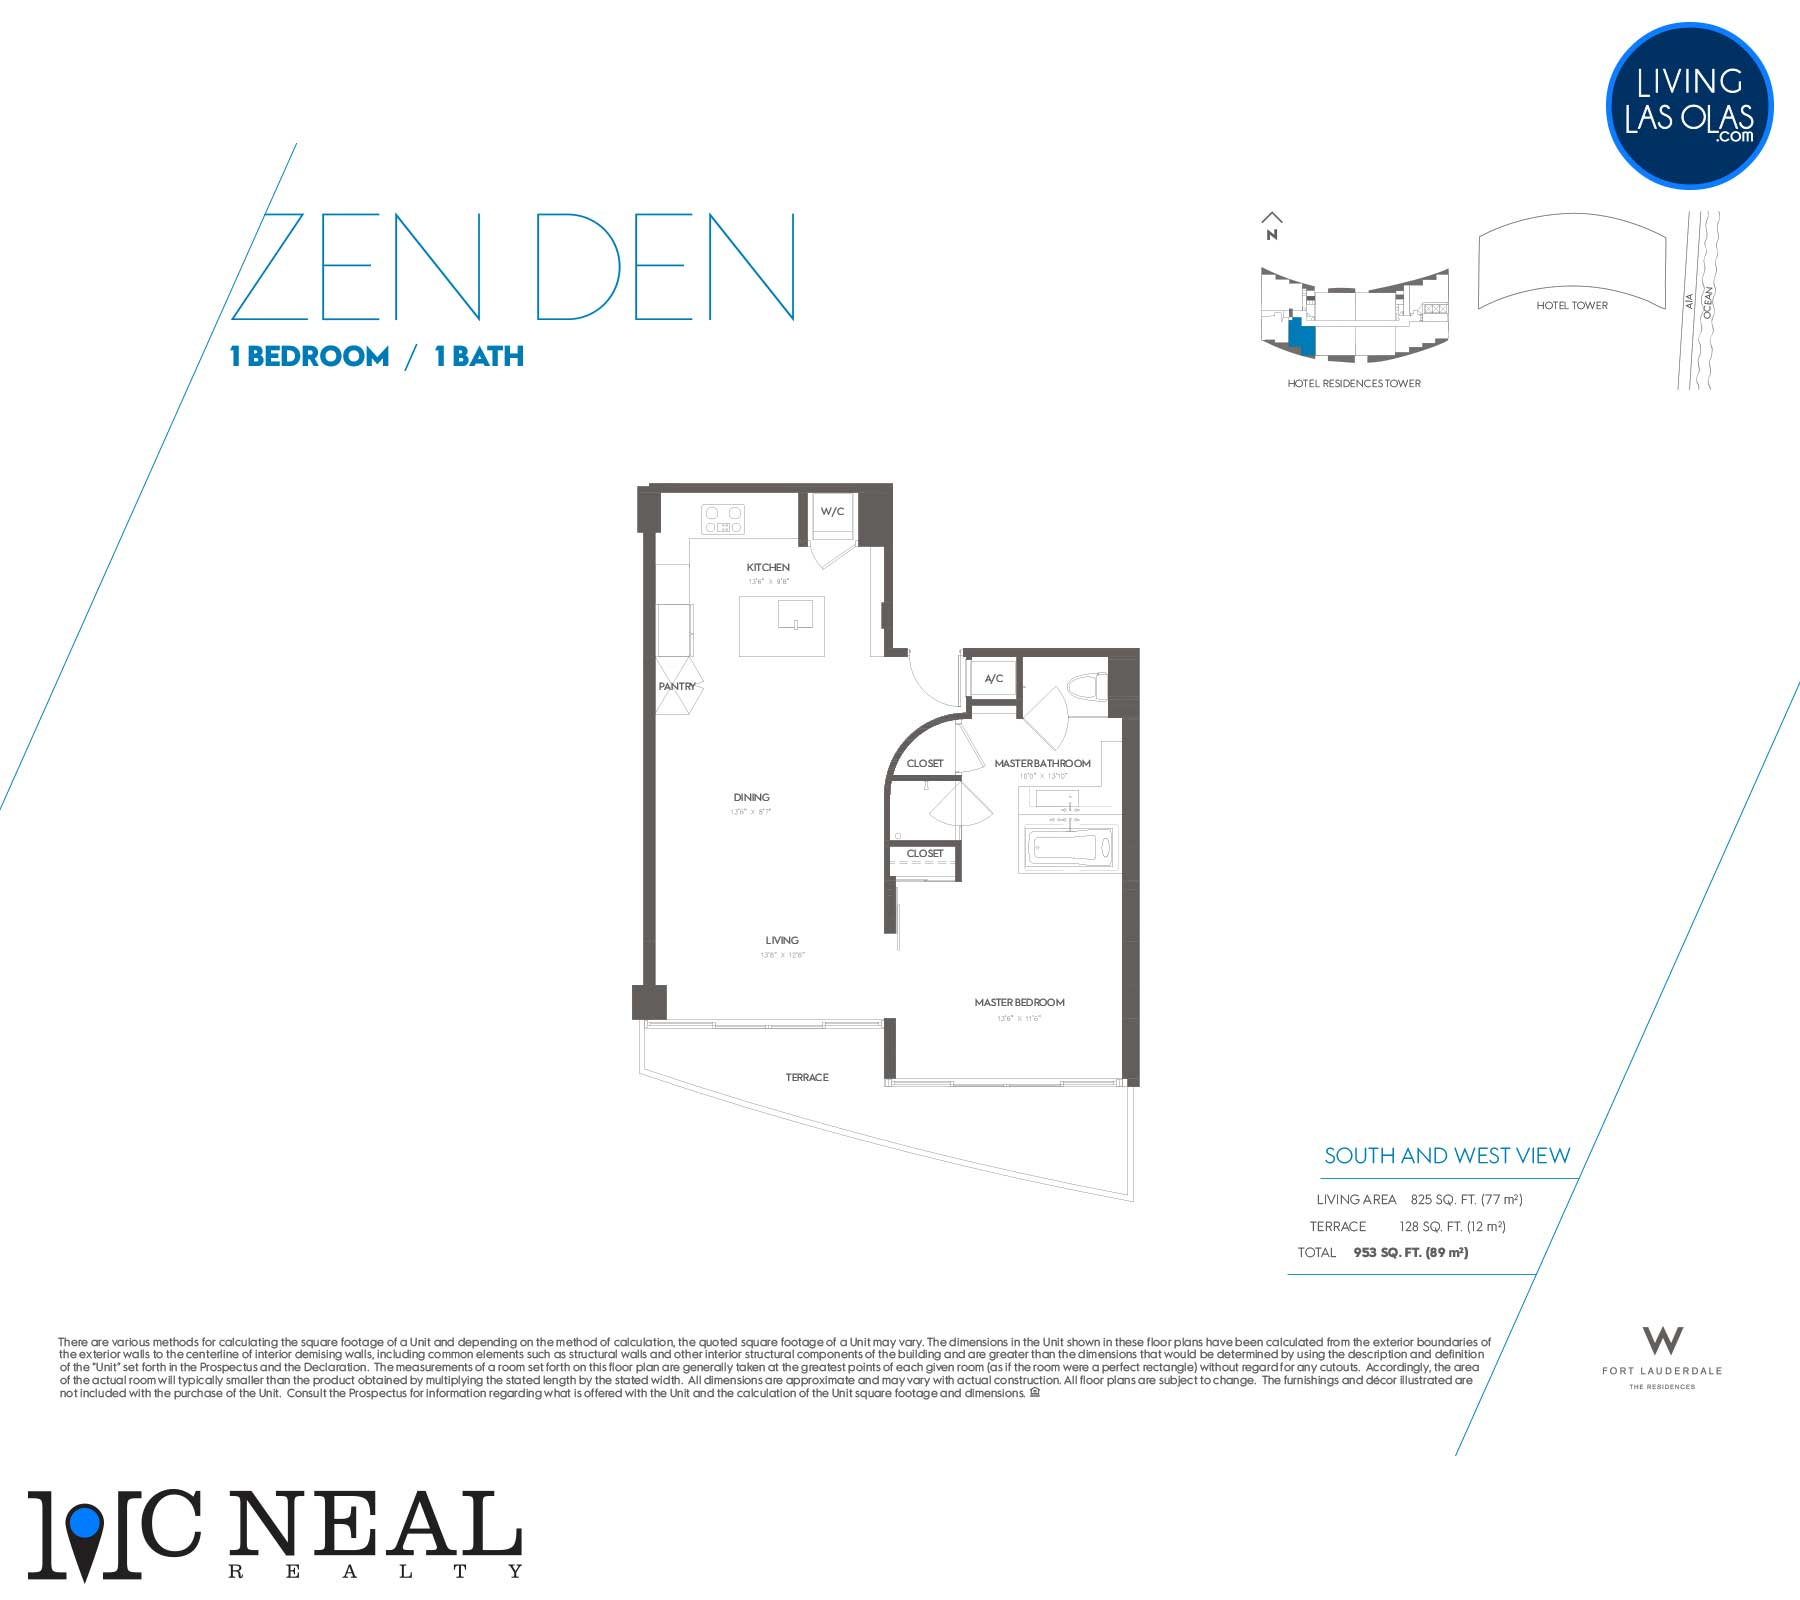 W Residences Fort Lauderdale Floor Plans Zen Den